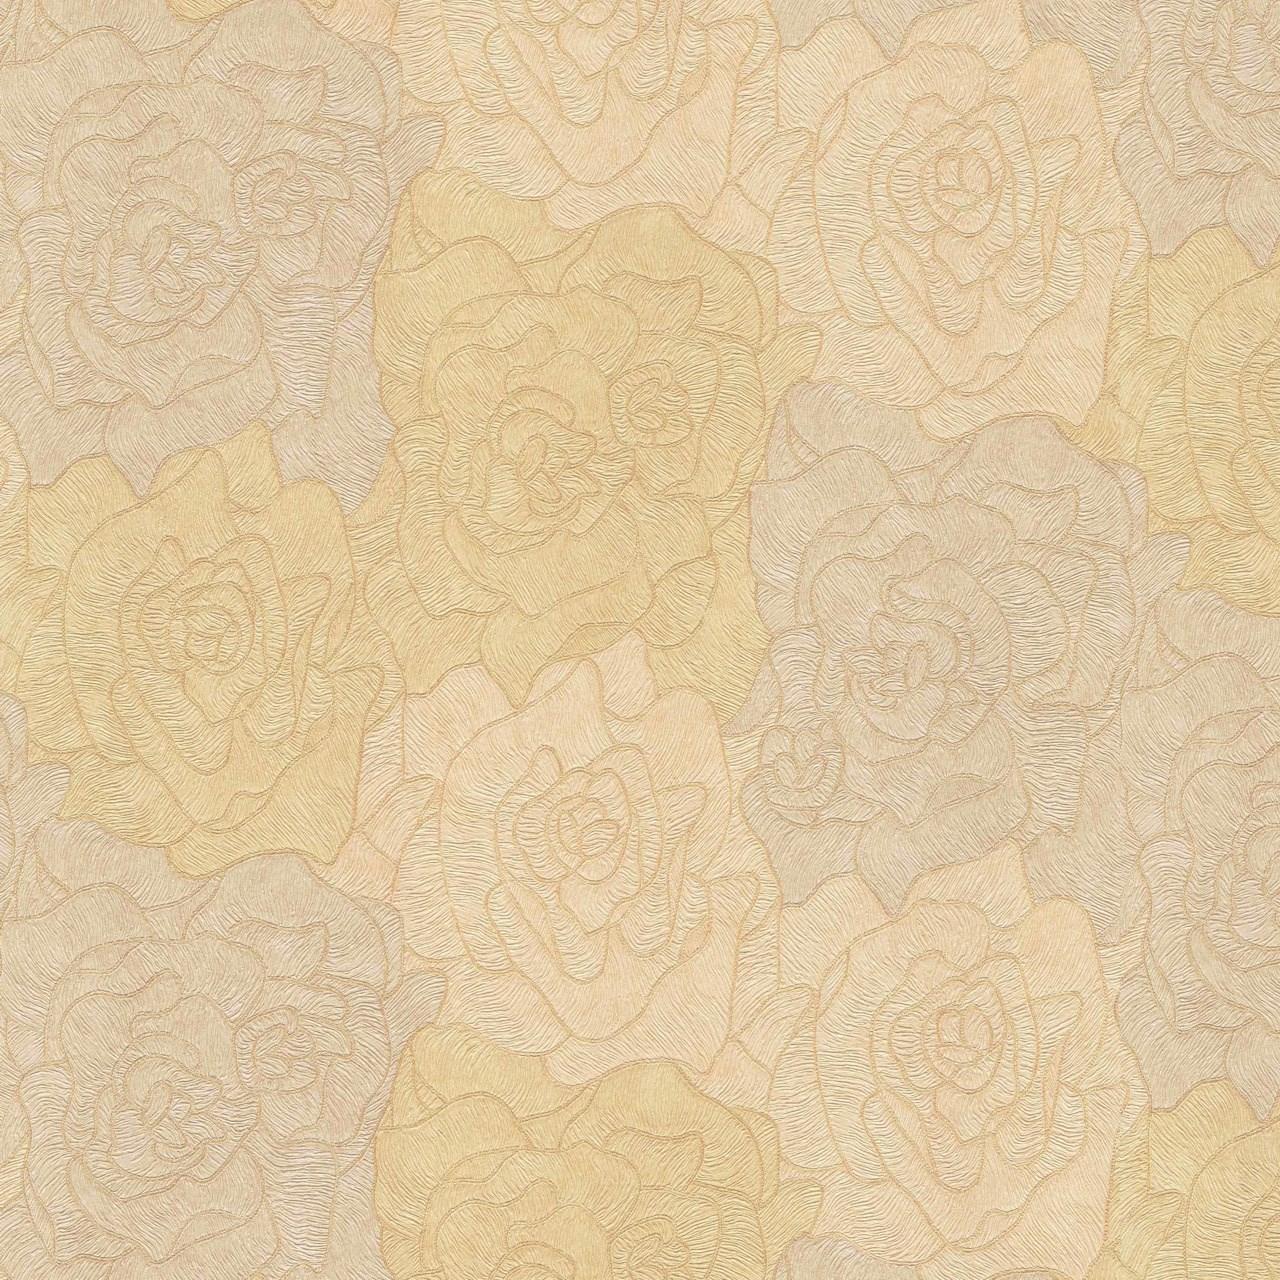 کاغذ دیواری والرین آلبوم گیورا کد 640101